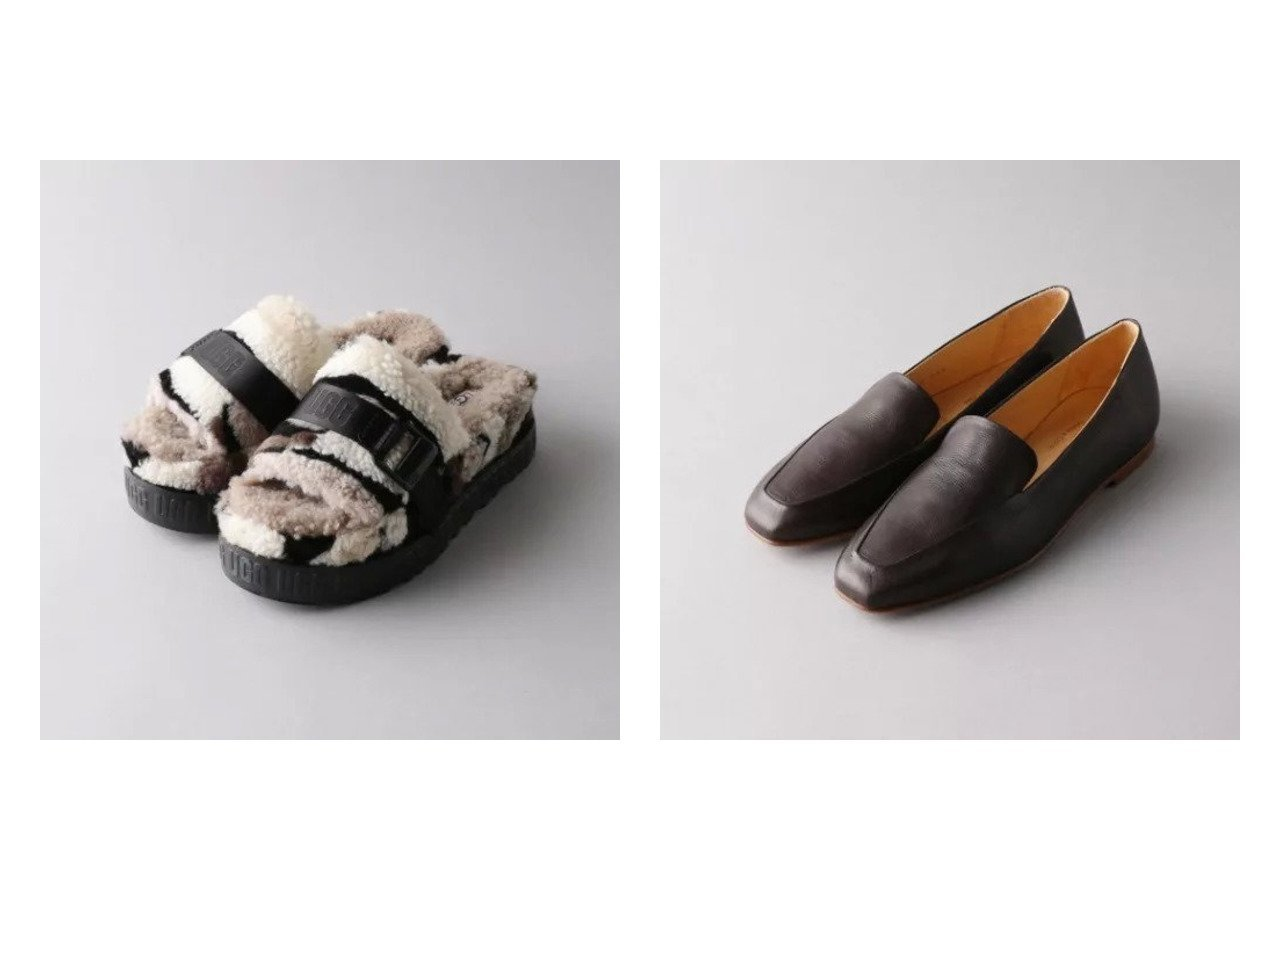 【Odette e Odile/オデット エ オディール】の【別注】PASCUCCI MOCA FLT&UGG W F-CALI COLLAGE 【シューズ・靴】おすすめ!人気、トレンド・レディースファッションの通販 おすすめで人気の流行・トレンド、ファッションの通販商品 メンズファッション・キッズファッション・インテリア・家具・レディースファッション・服の通販 founy(ファニー) https://founy.com/ ファッション Fashion レディースファッション WOMEN サンダル シューズ フォルム フラット 別注  ID:crp329100000025450